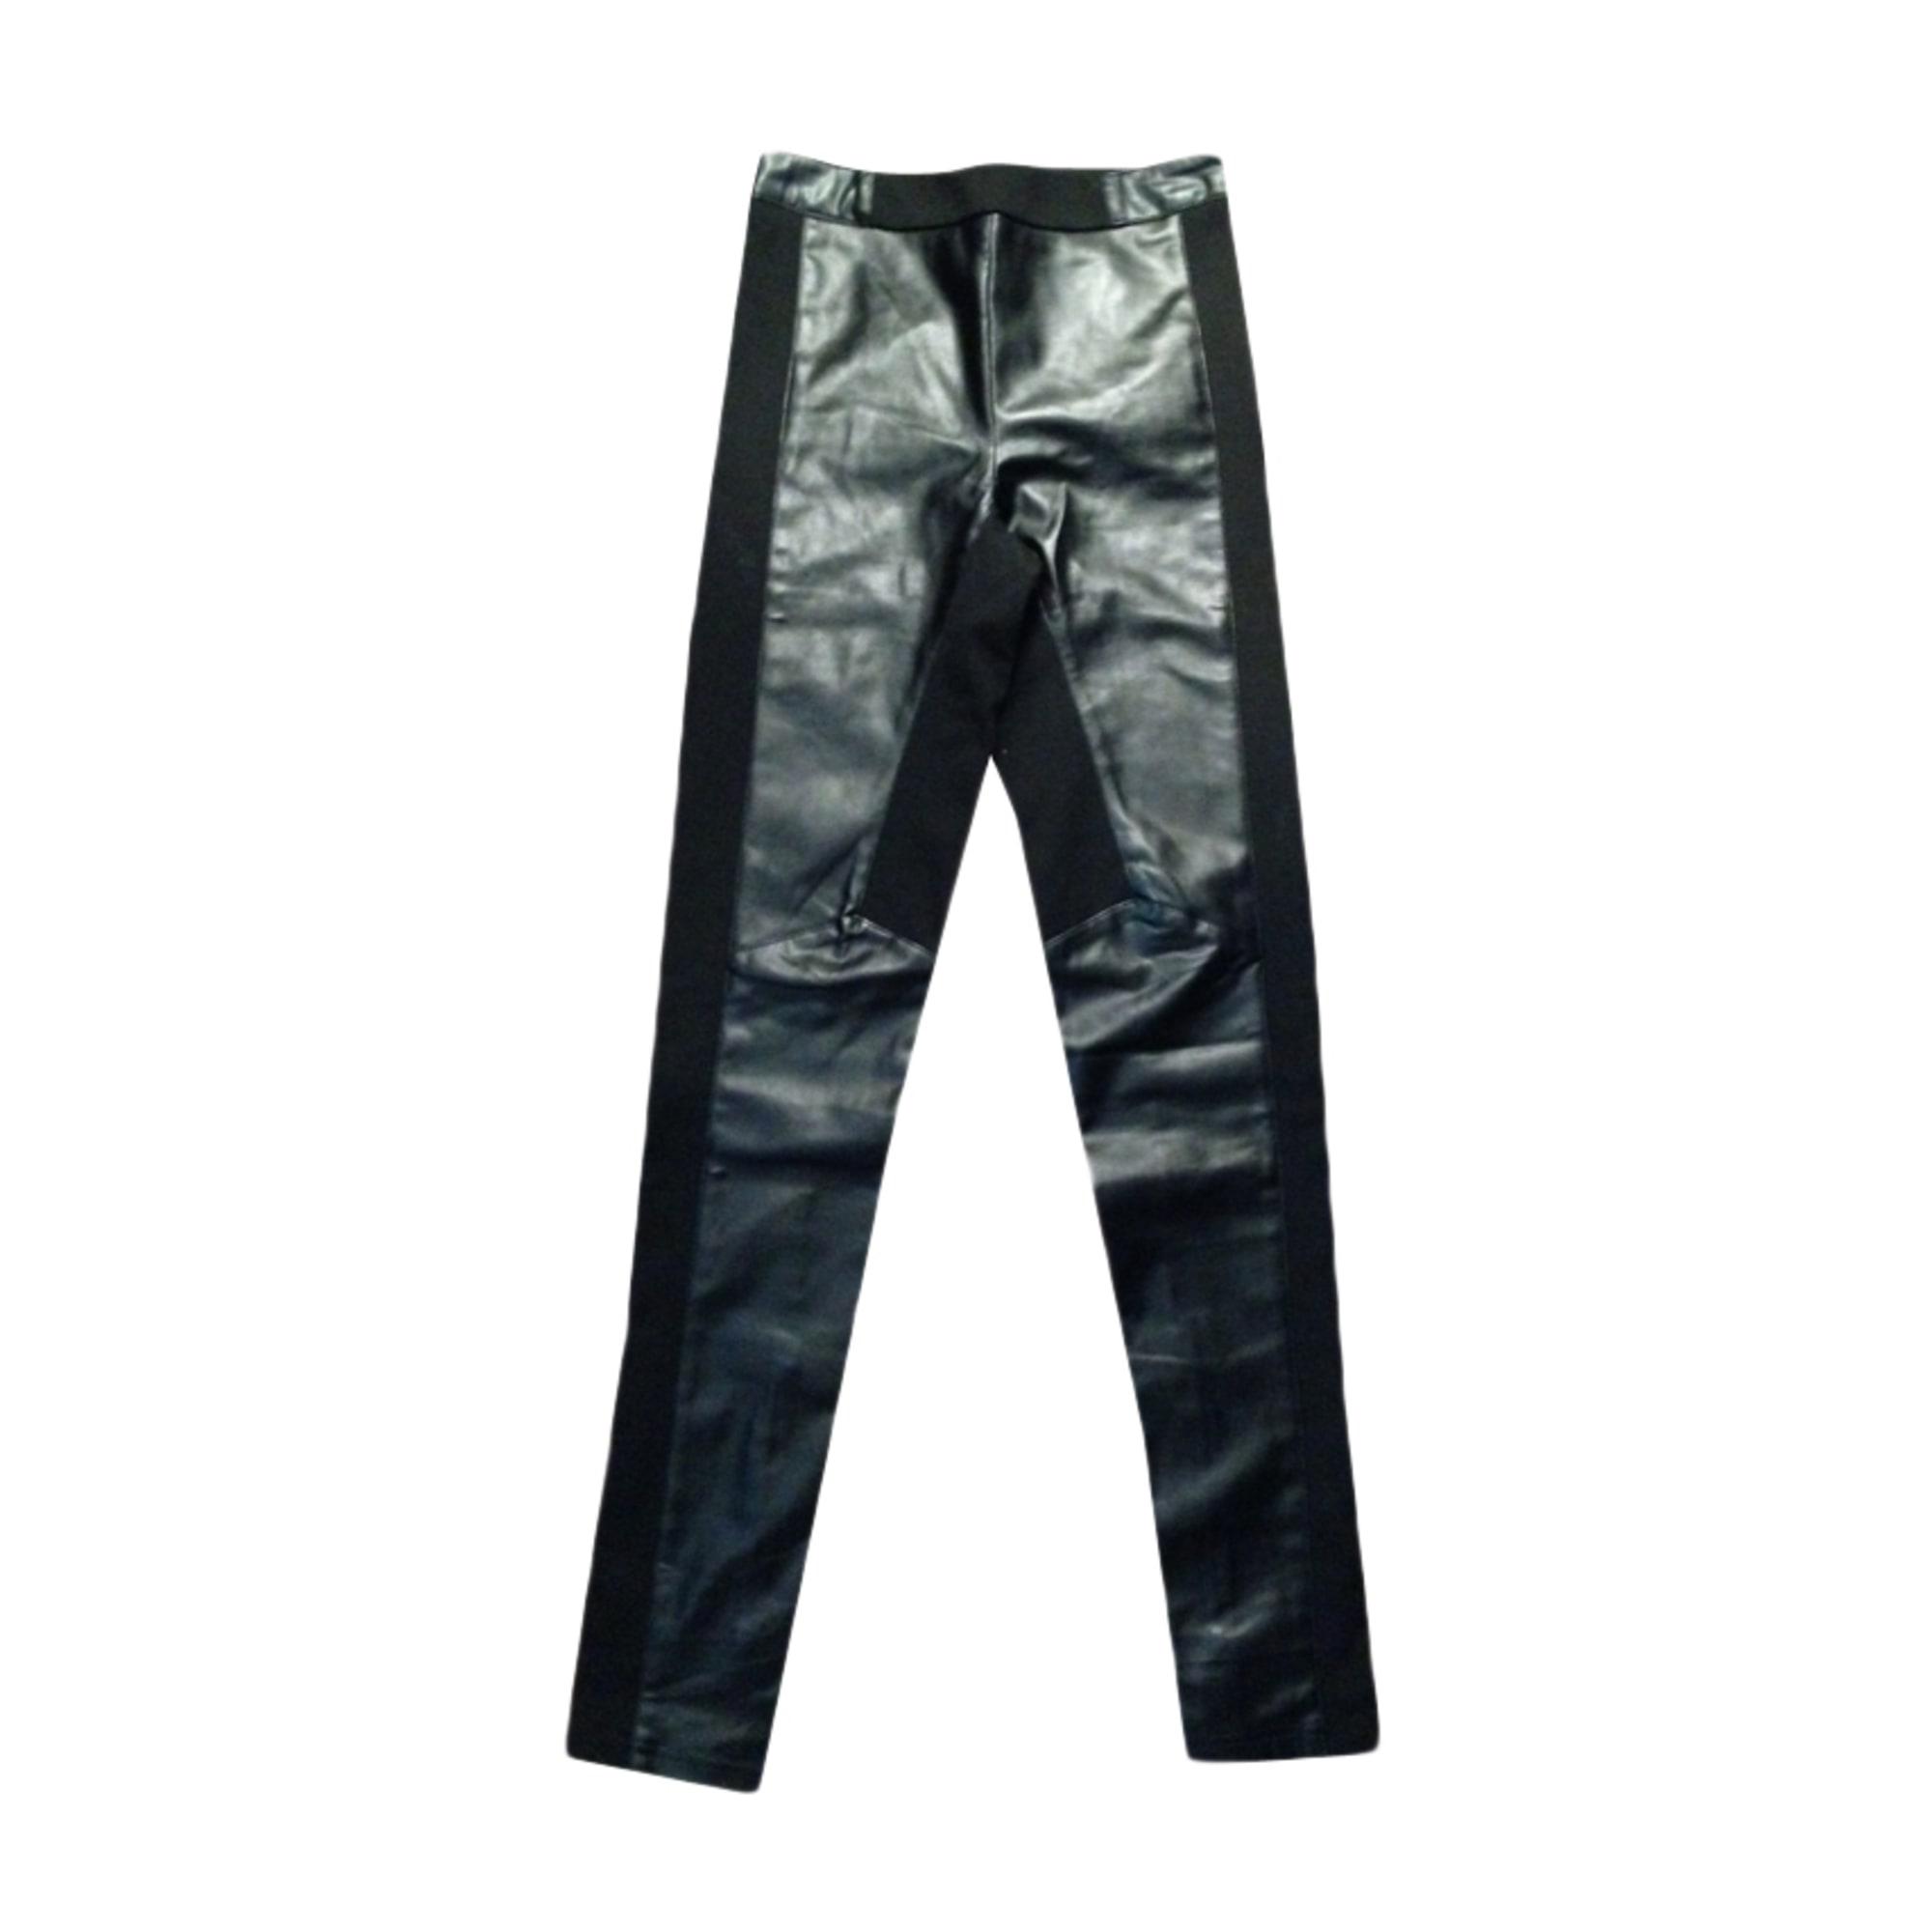 Pantalon slim, cigarette GERARD DAREL 36 (S, T1) noir - 1794996 e7d0c91d25f5